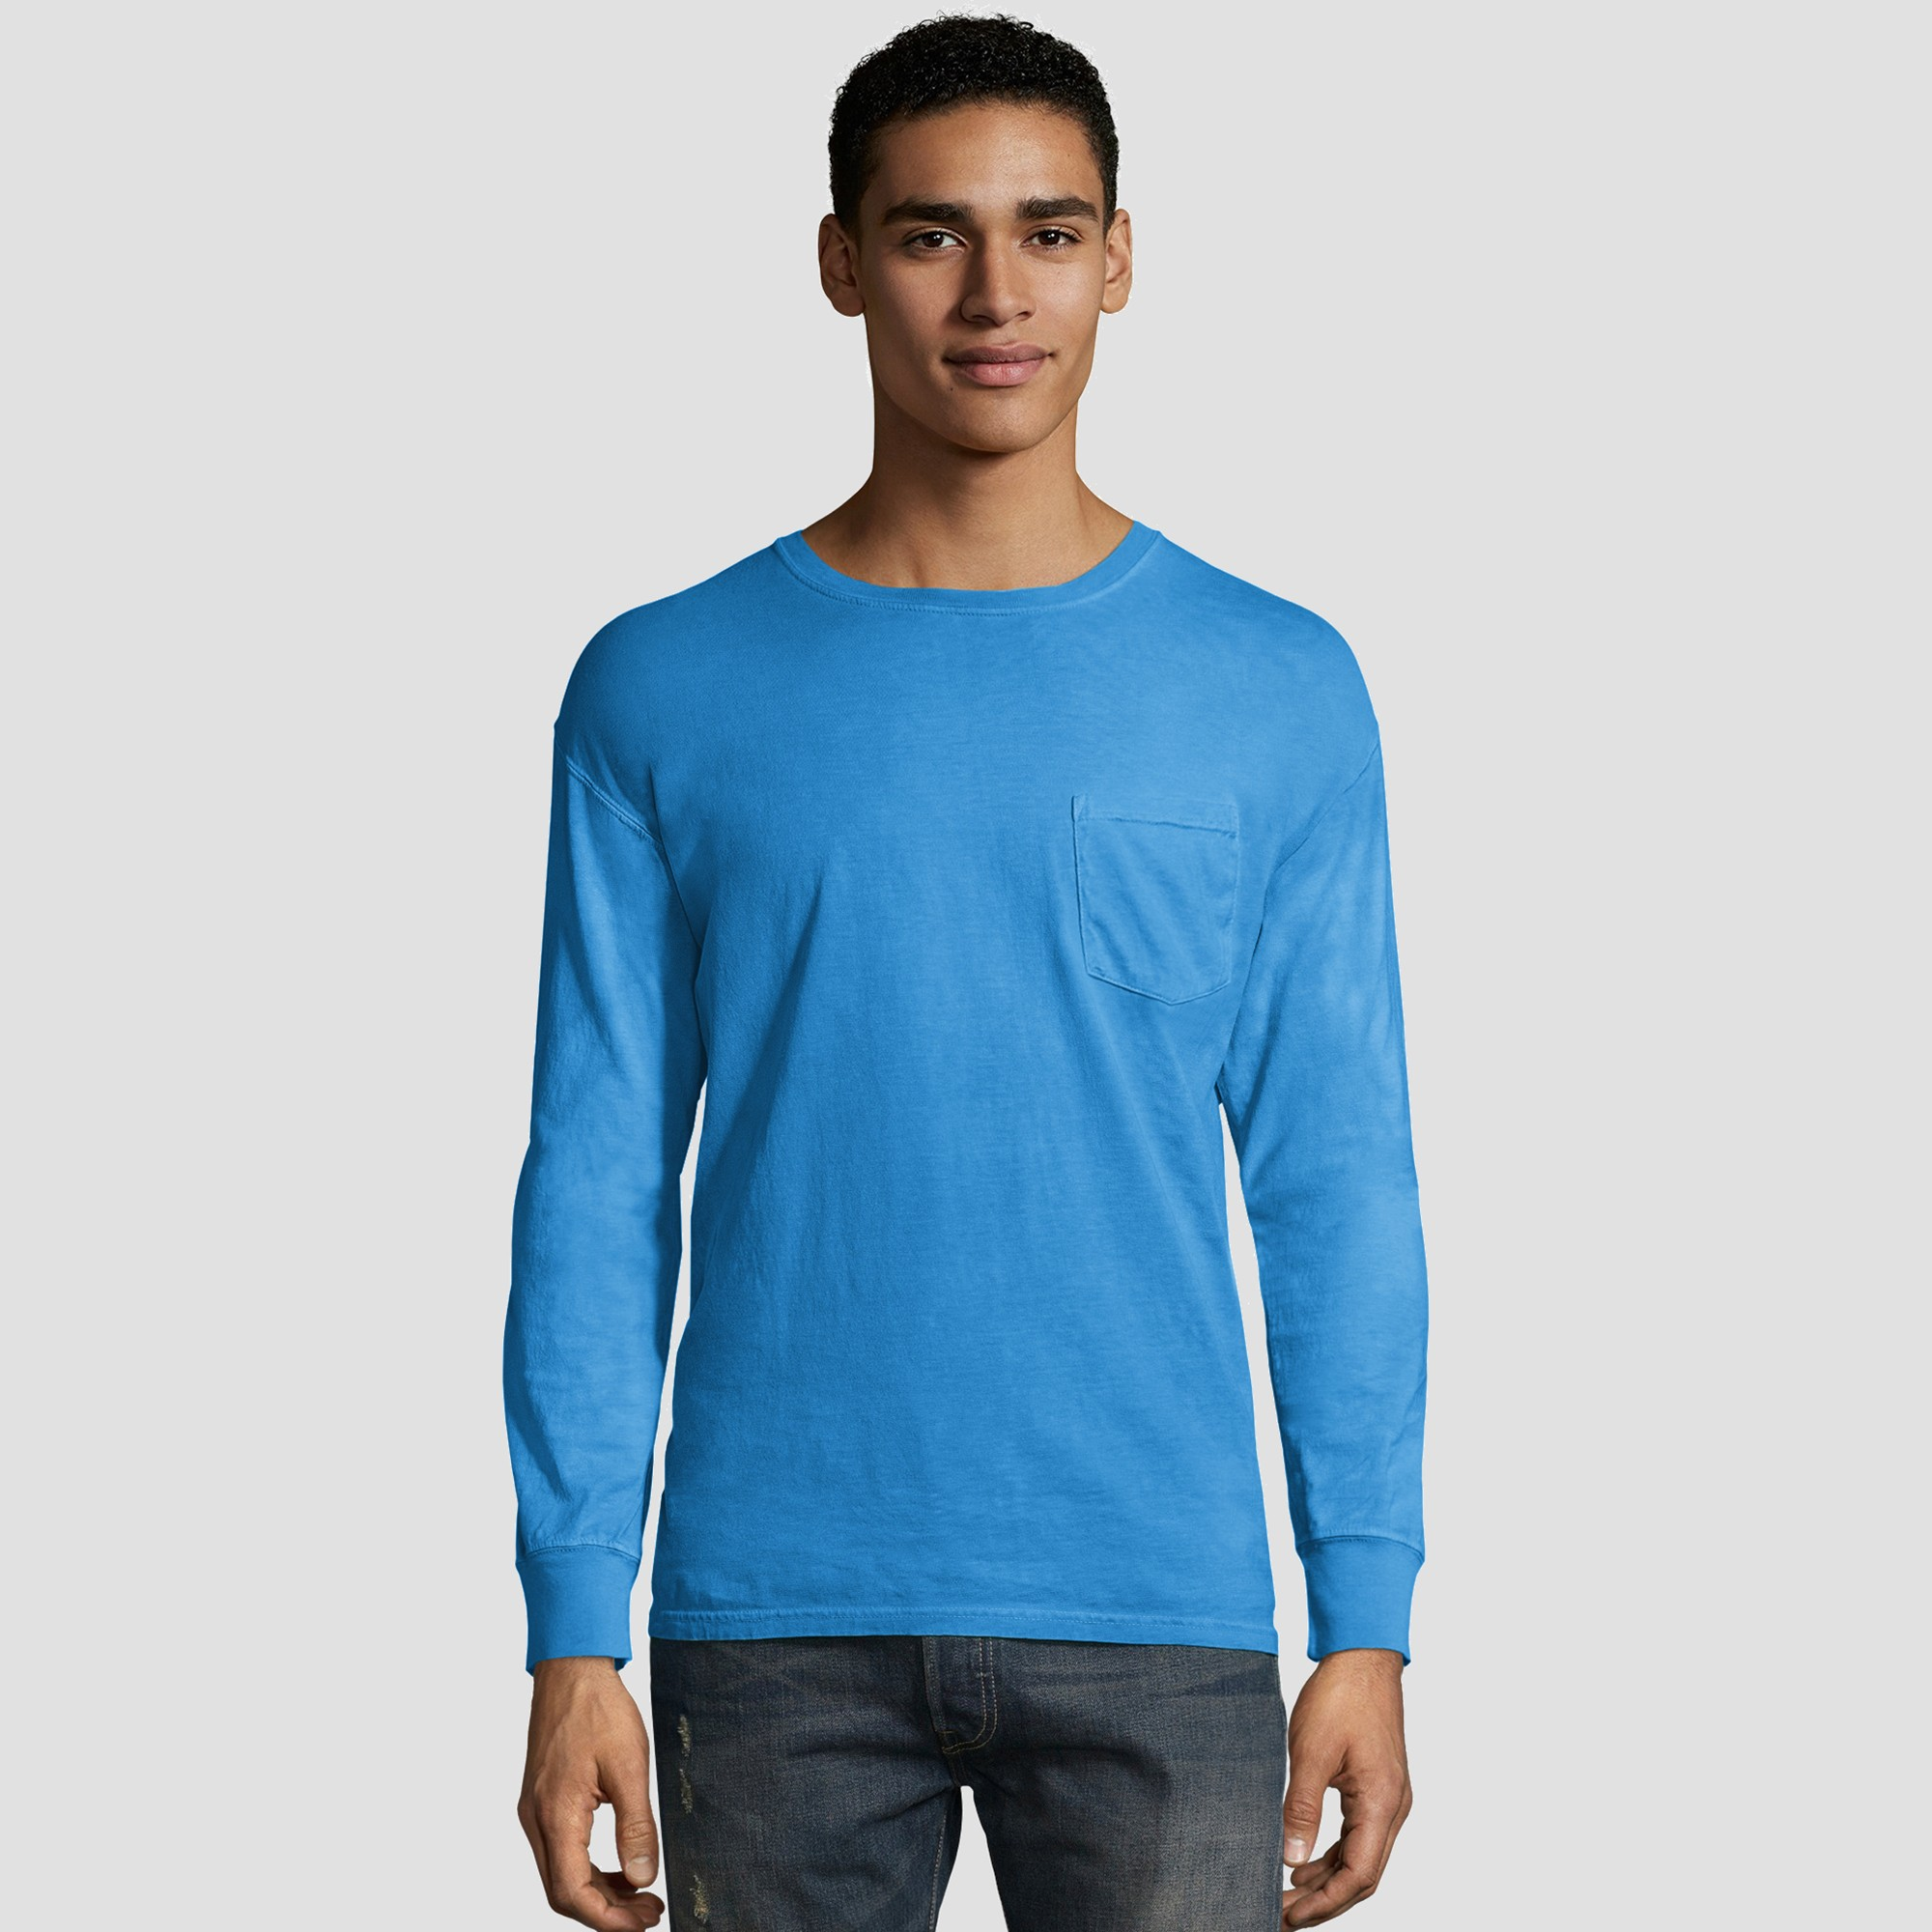 Hanes Men's Long Sleeve 1901 Garment Dyed Pocket T-Shirt - Sky Blue S